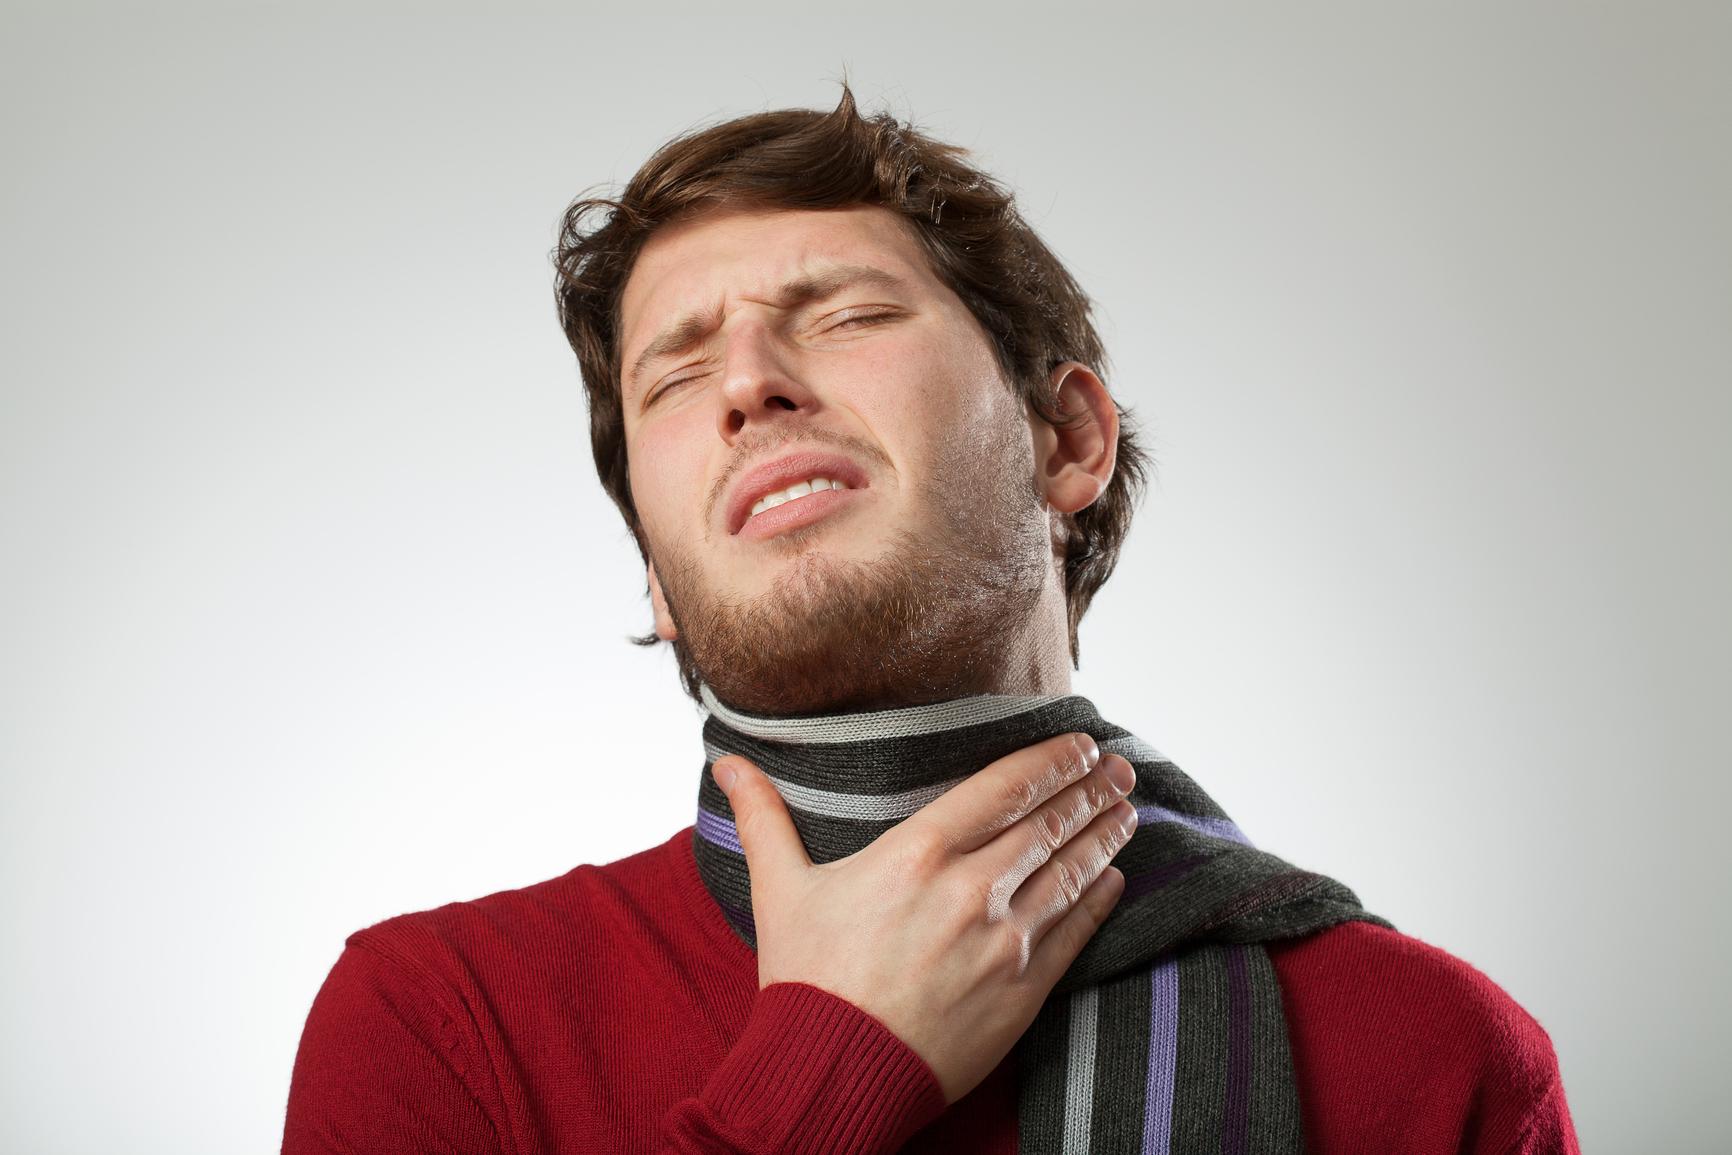 мужчина укутал горло шарфом